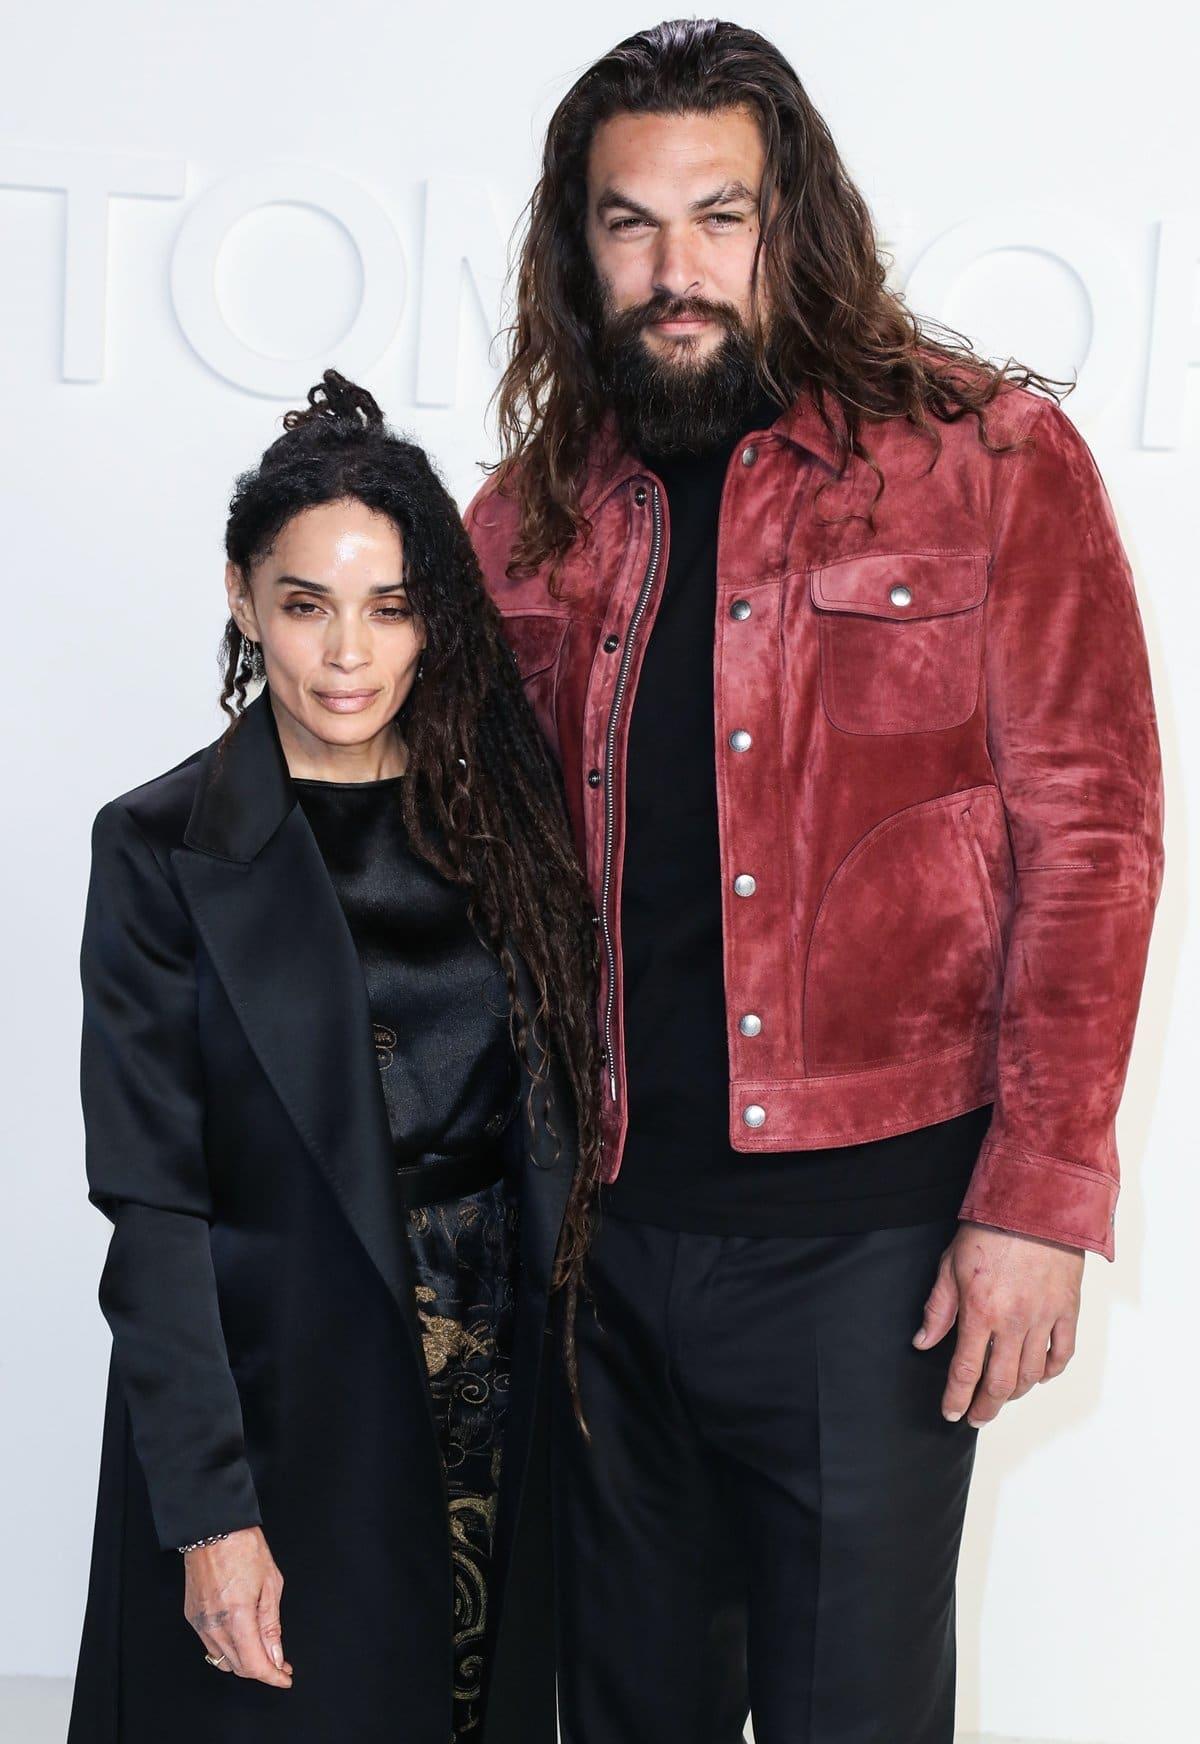 Lisa Bonet is 12 years older than her husband Jason Momoa